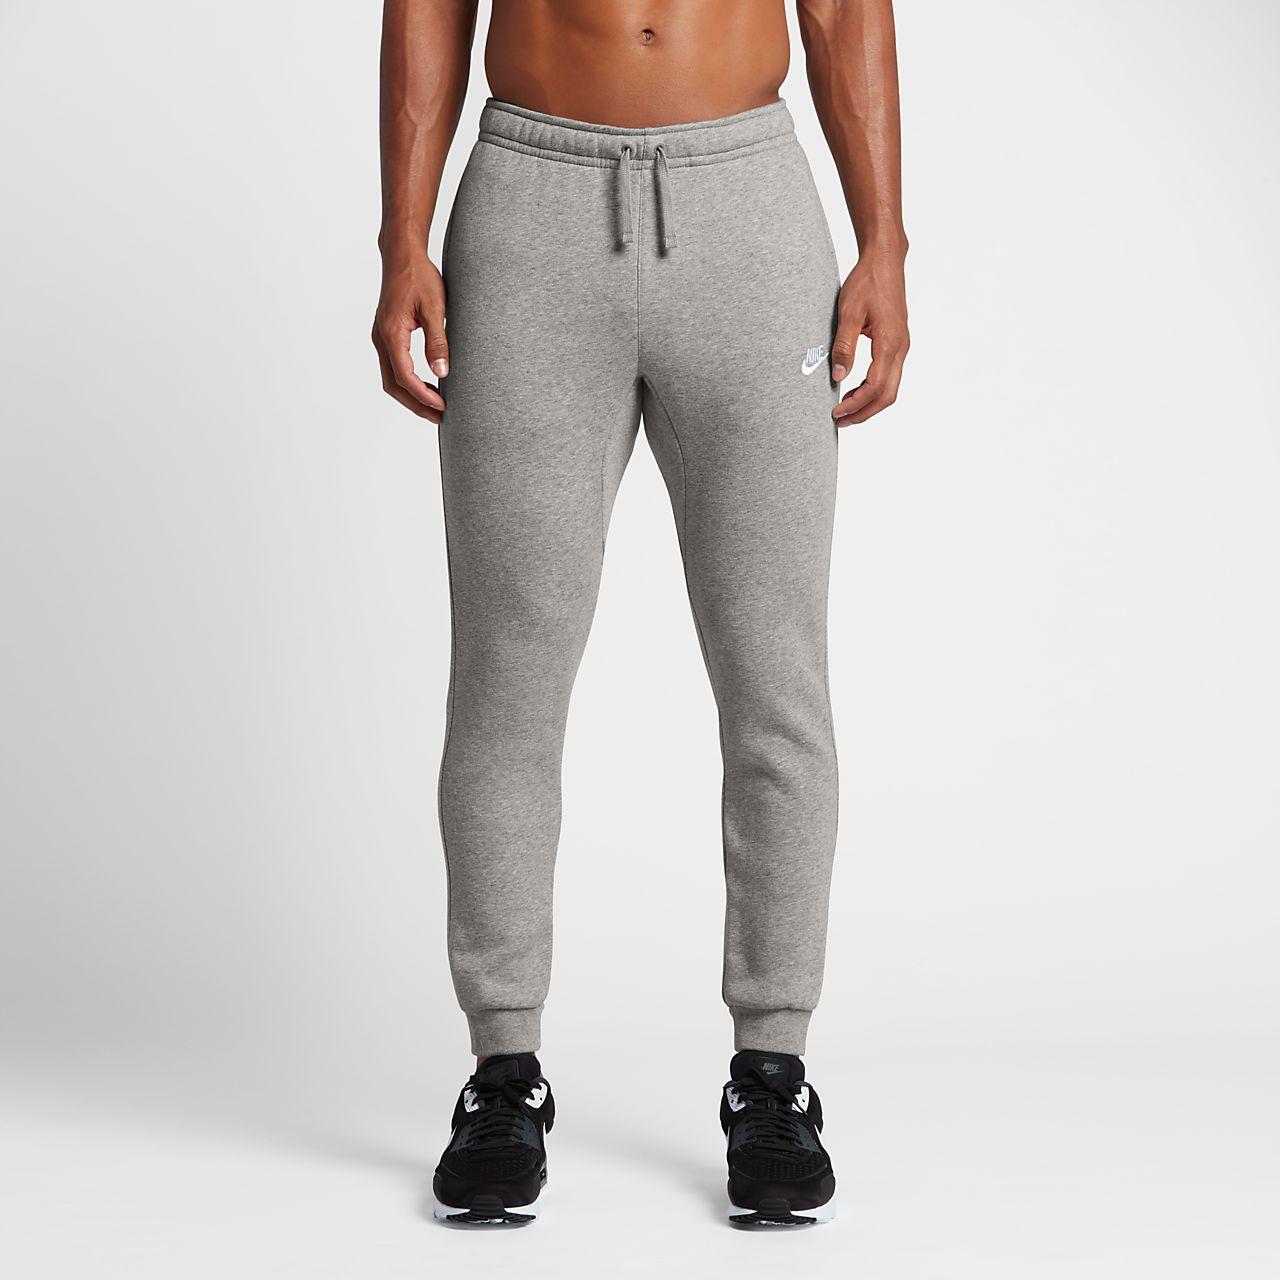 67b6e999364baf Nike Sportswear Club Fleece Herren-Jogger. Nike.com DE